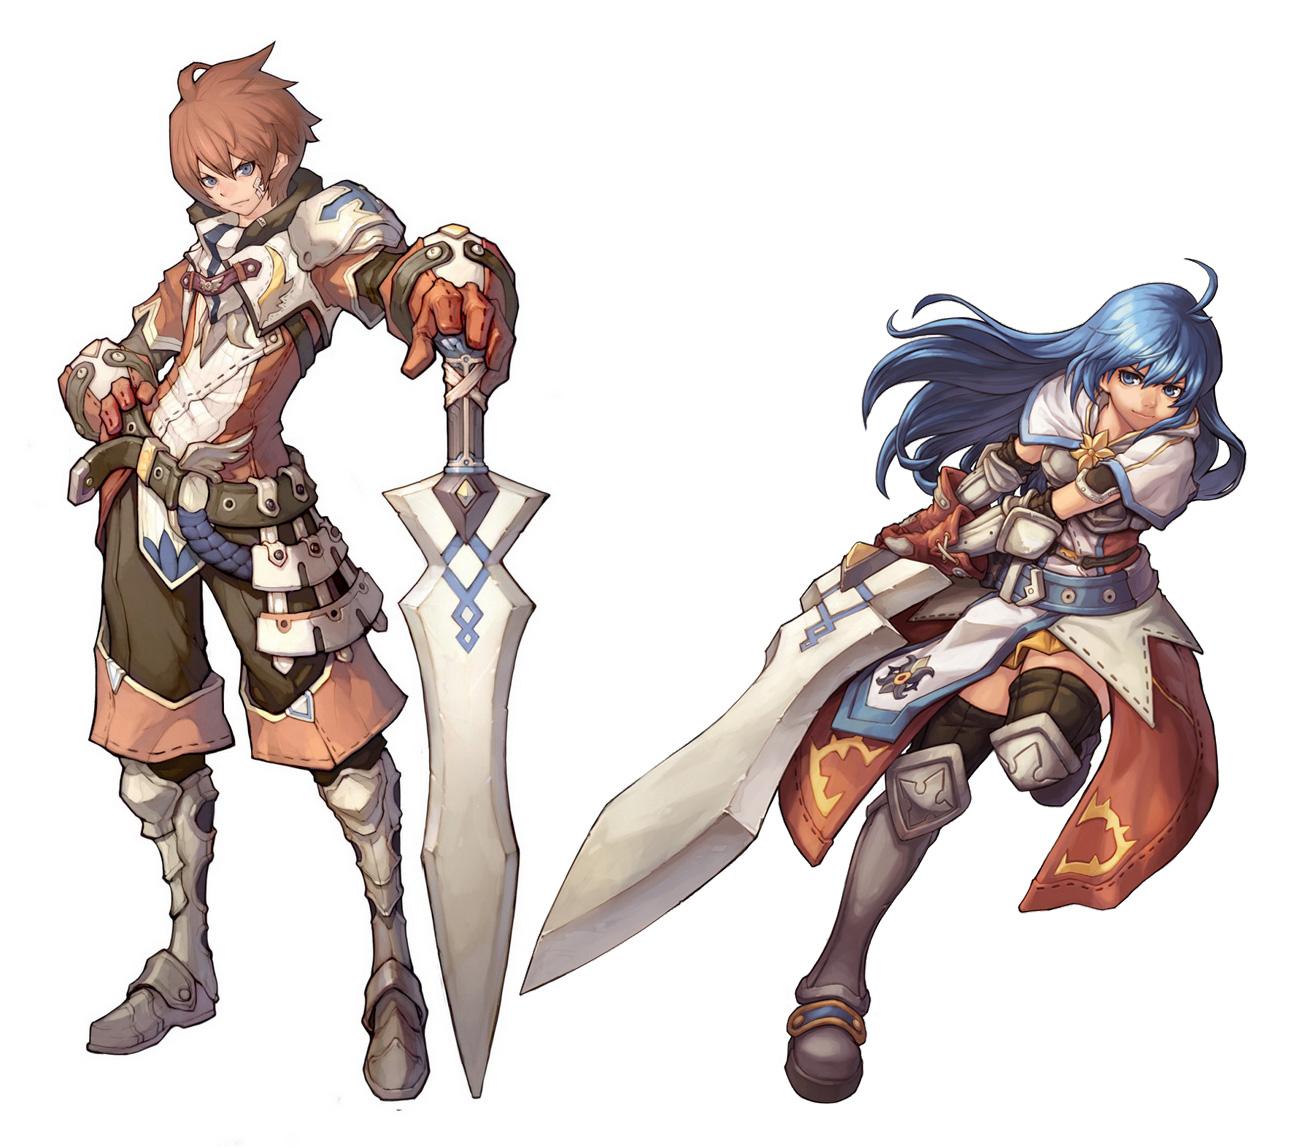 Images of Swordsman | 1294x1147